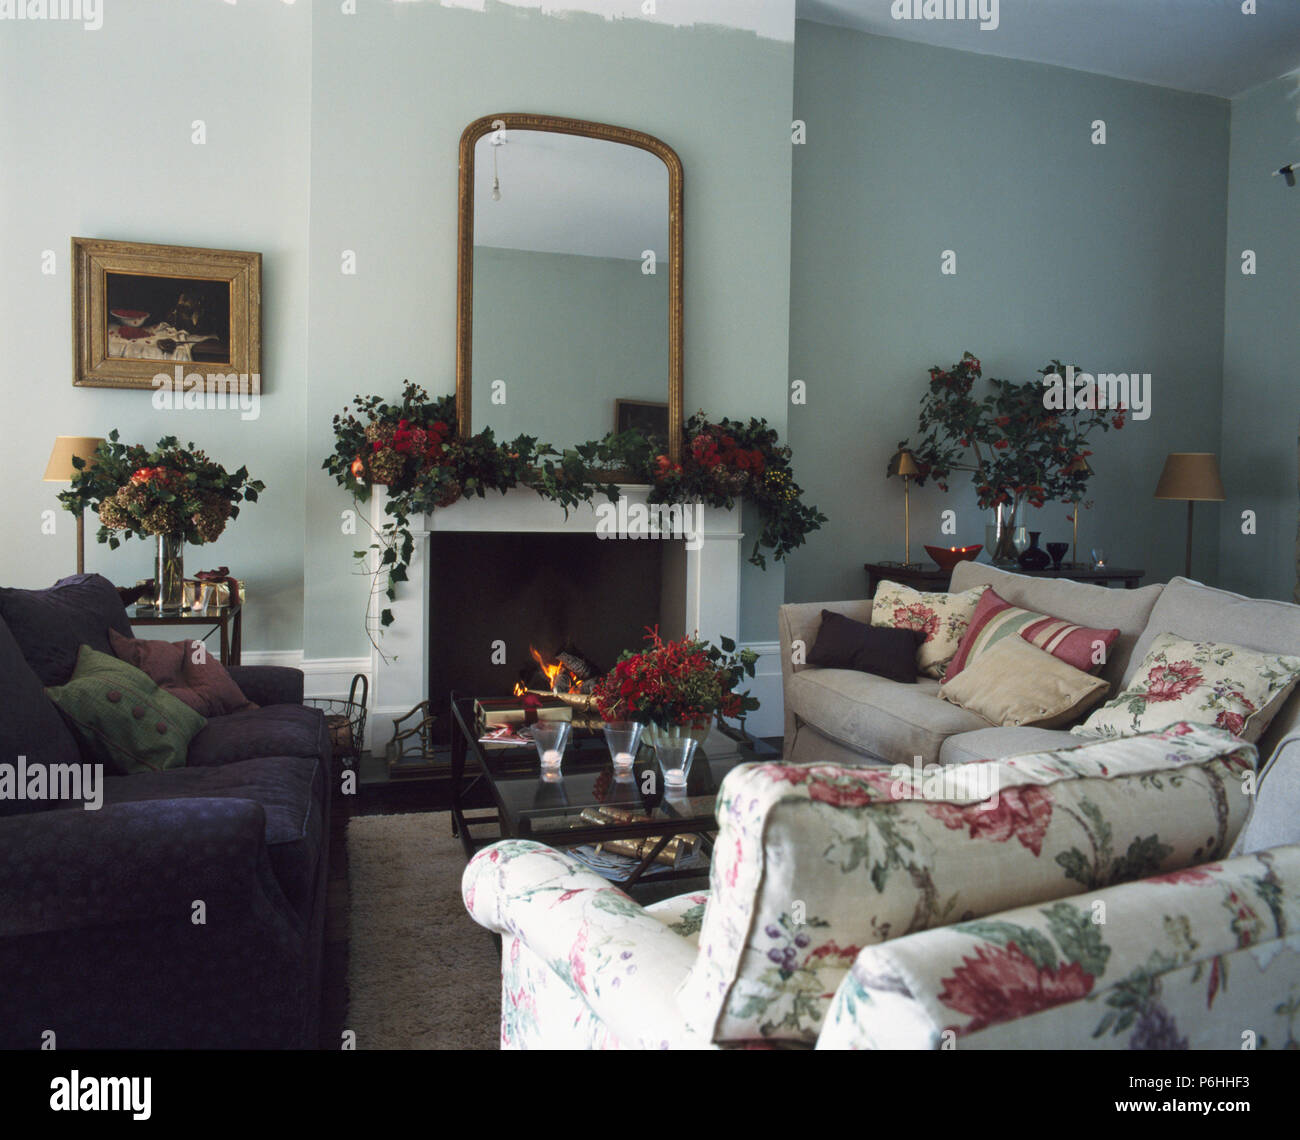 Living Room Uk Christmas Stock Photos & Living Room Uk